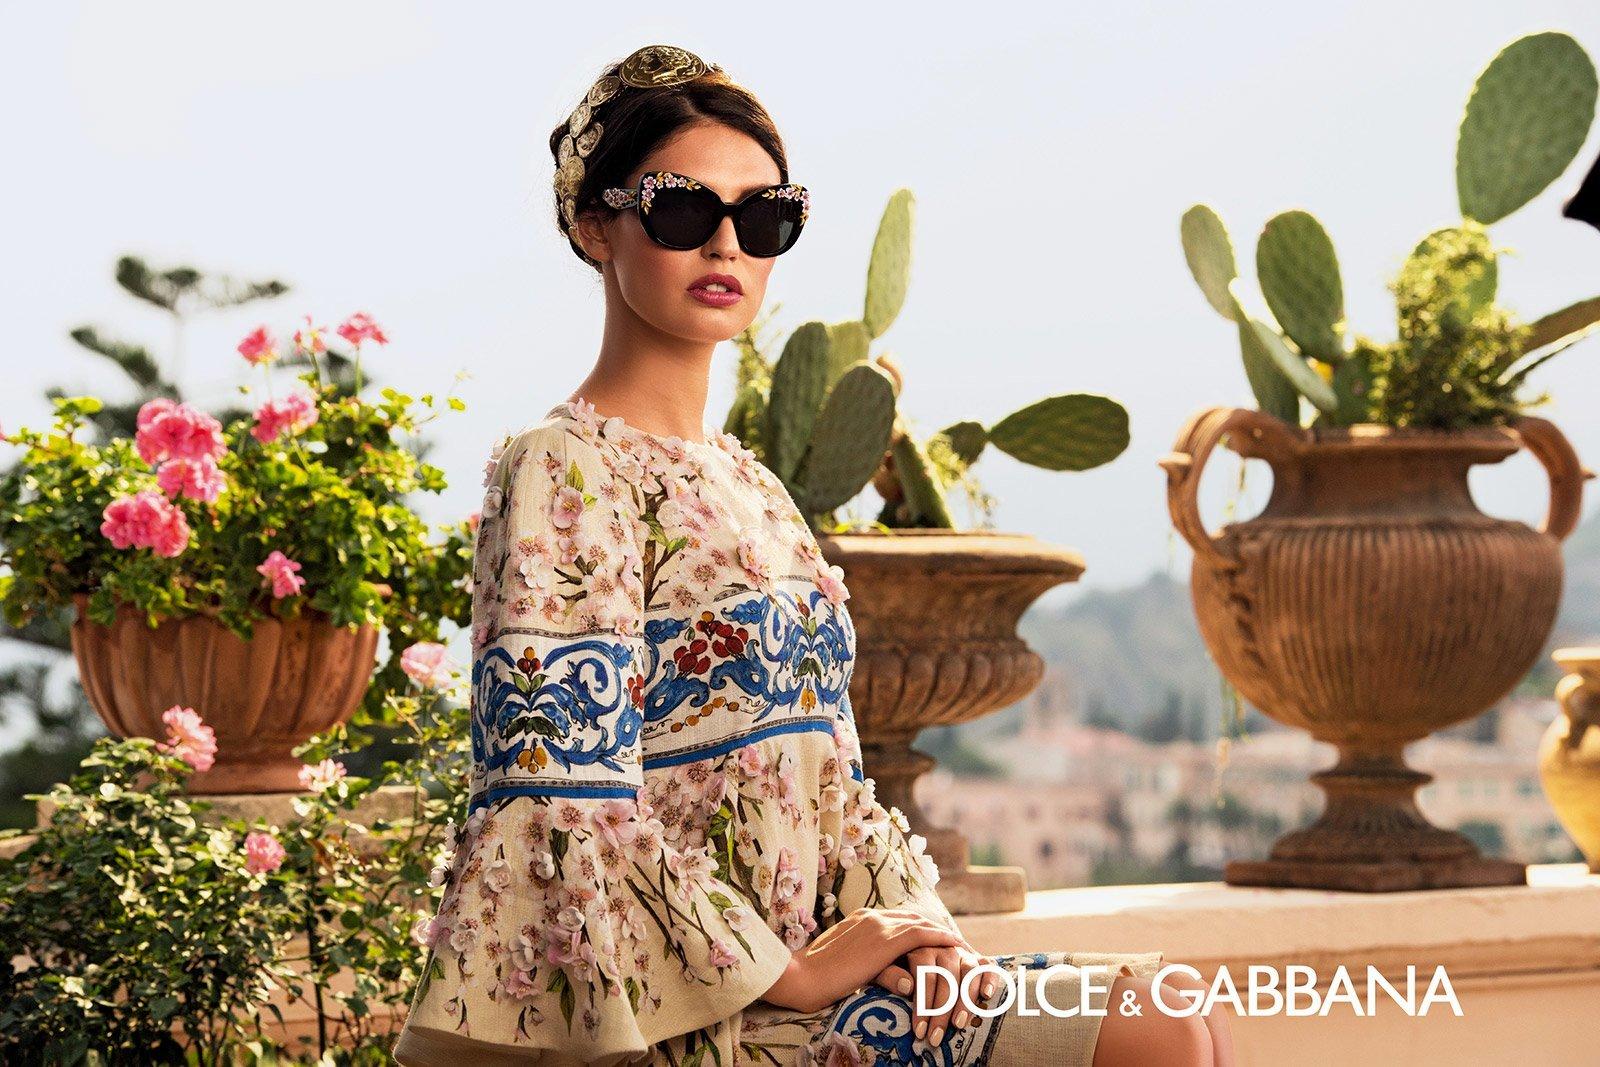 c787a3b3515 dolce-gabbana-adv-sunglasses-campaign-ss-2014-women-01 – SelectSpecs ...